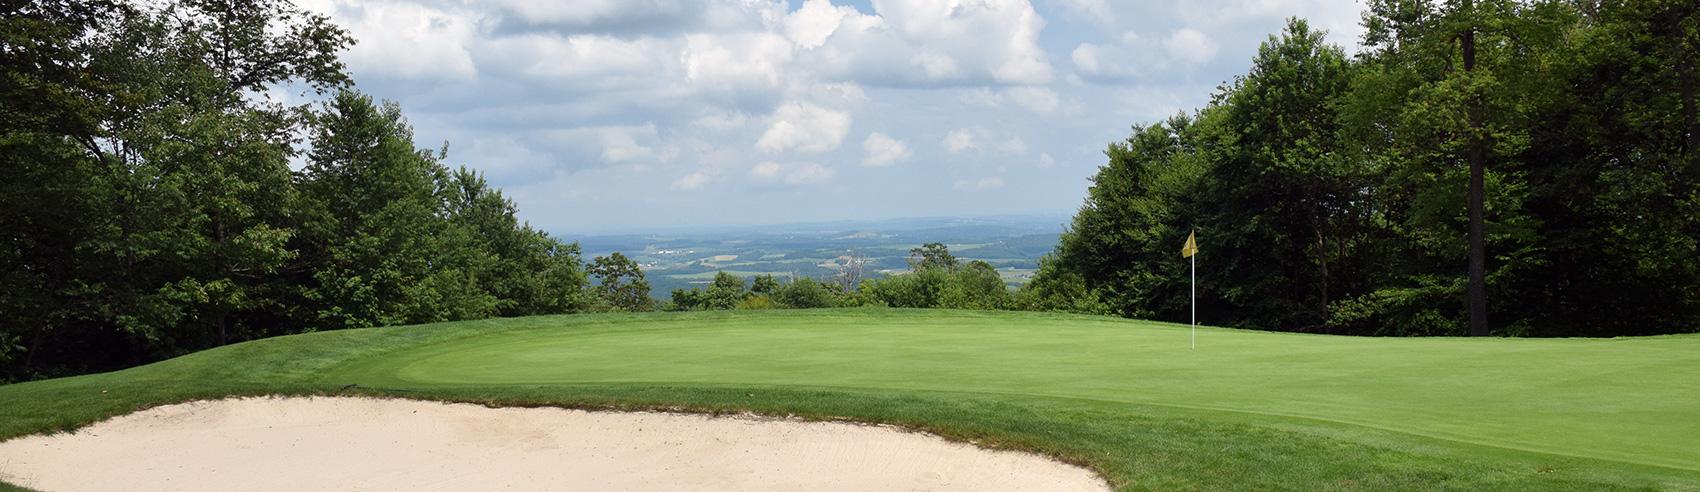 golf-scenic-1